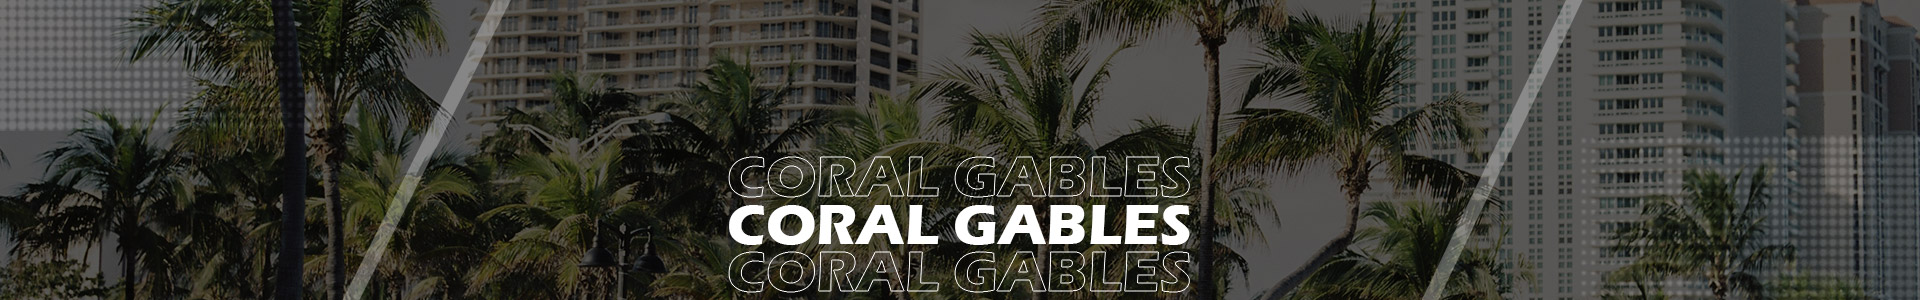 coral-gables-landing